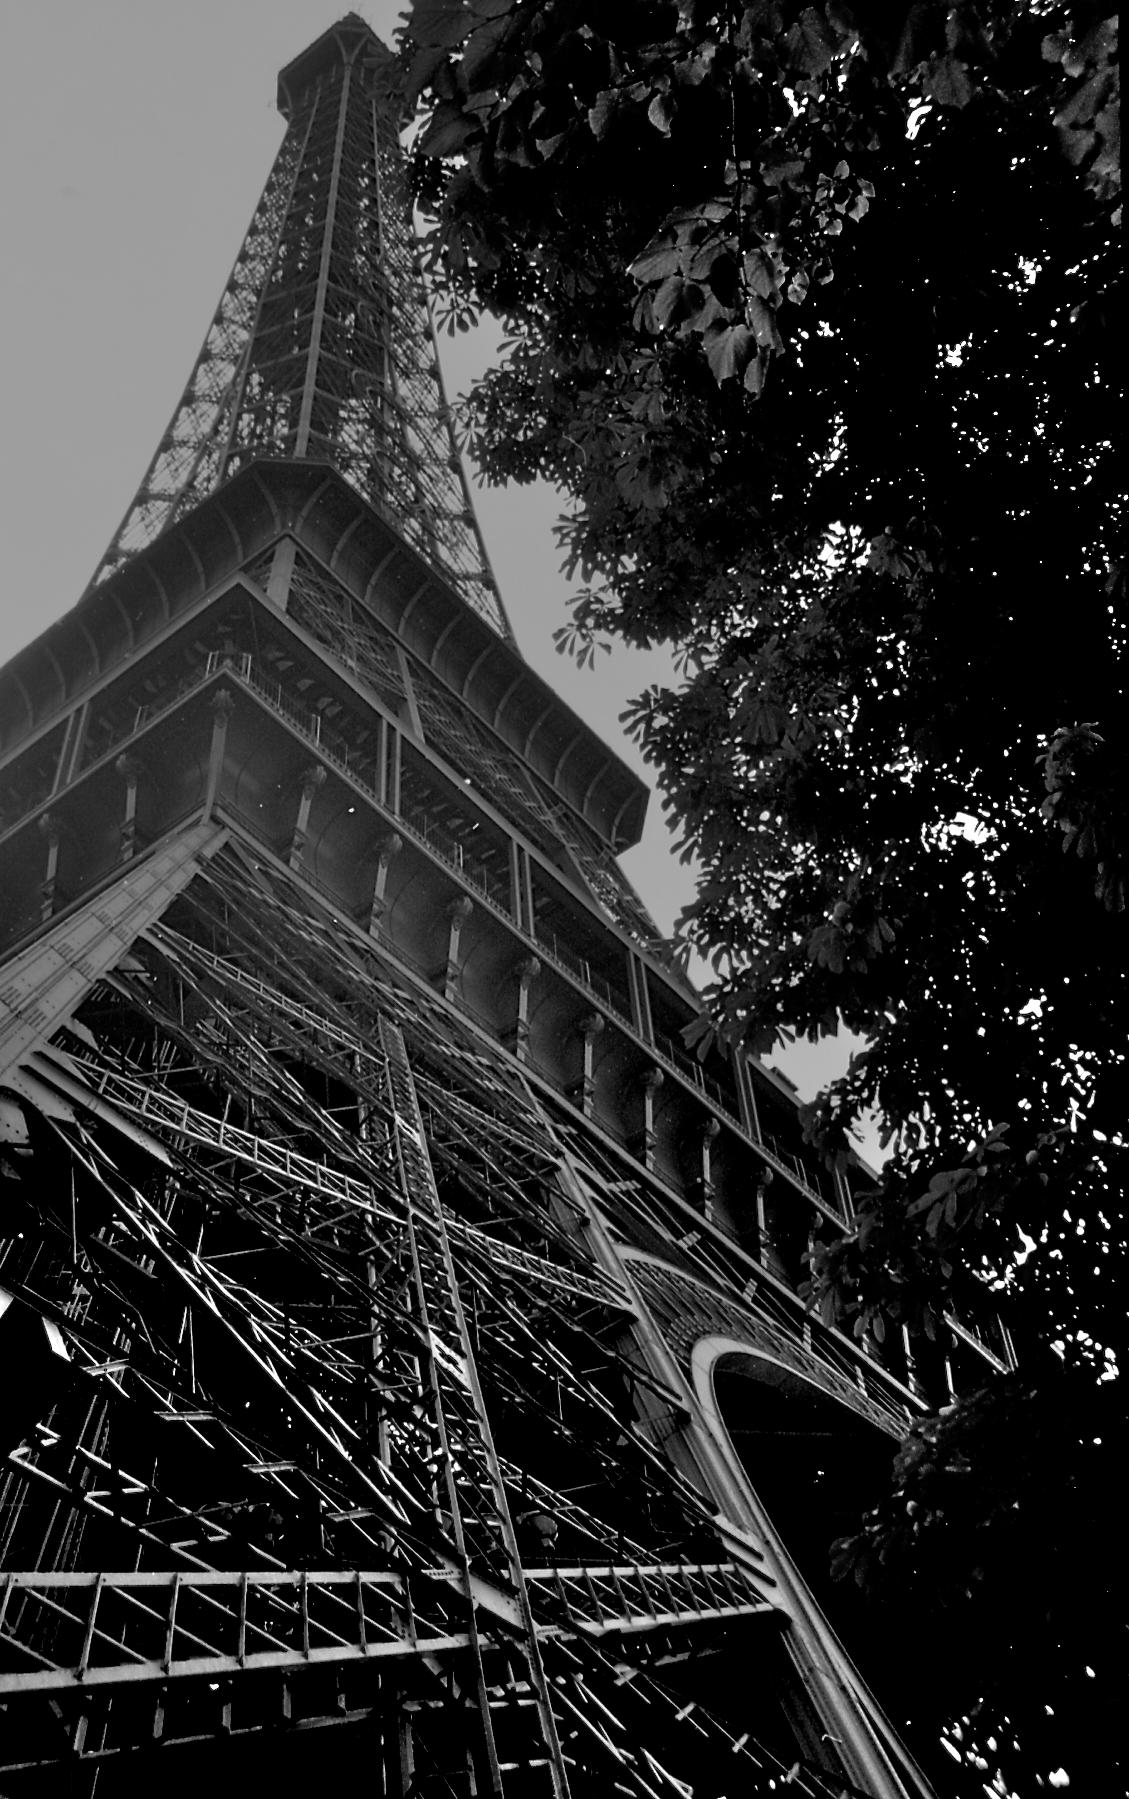 Eiffel Tower 29 Aug 1989